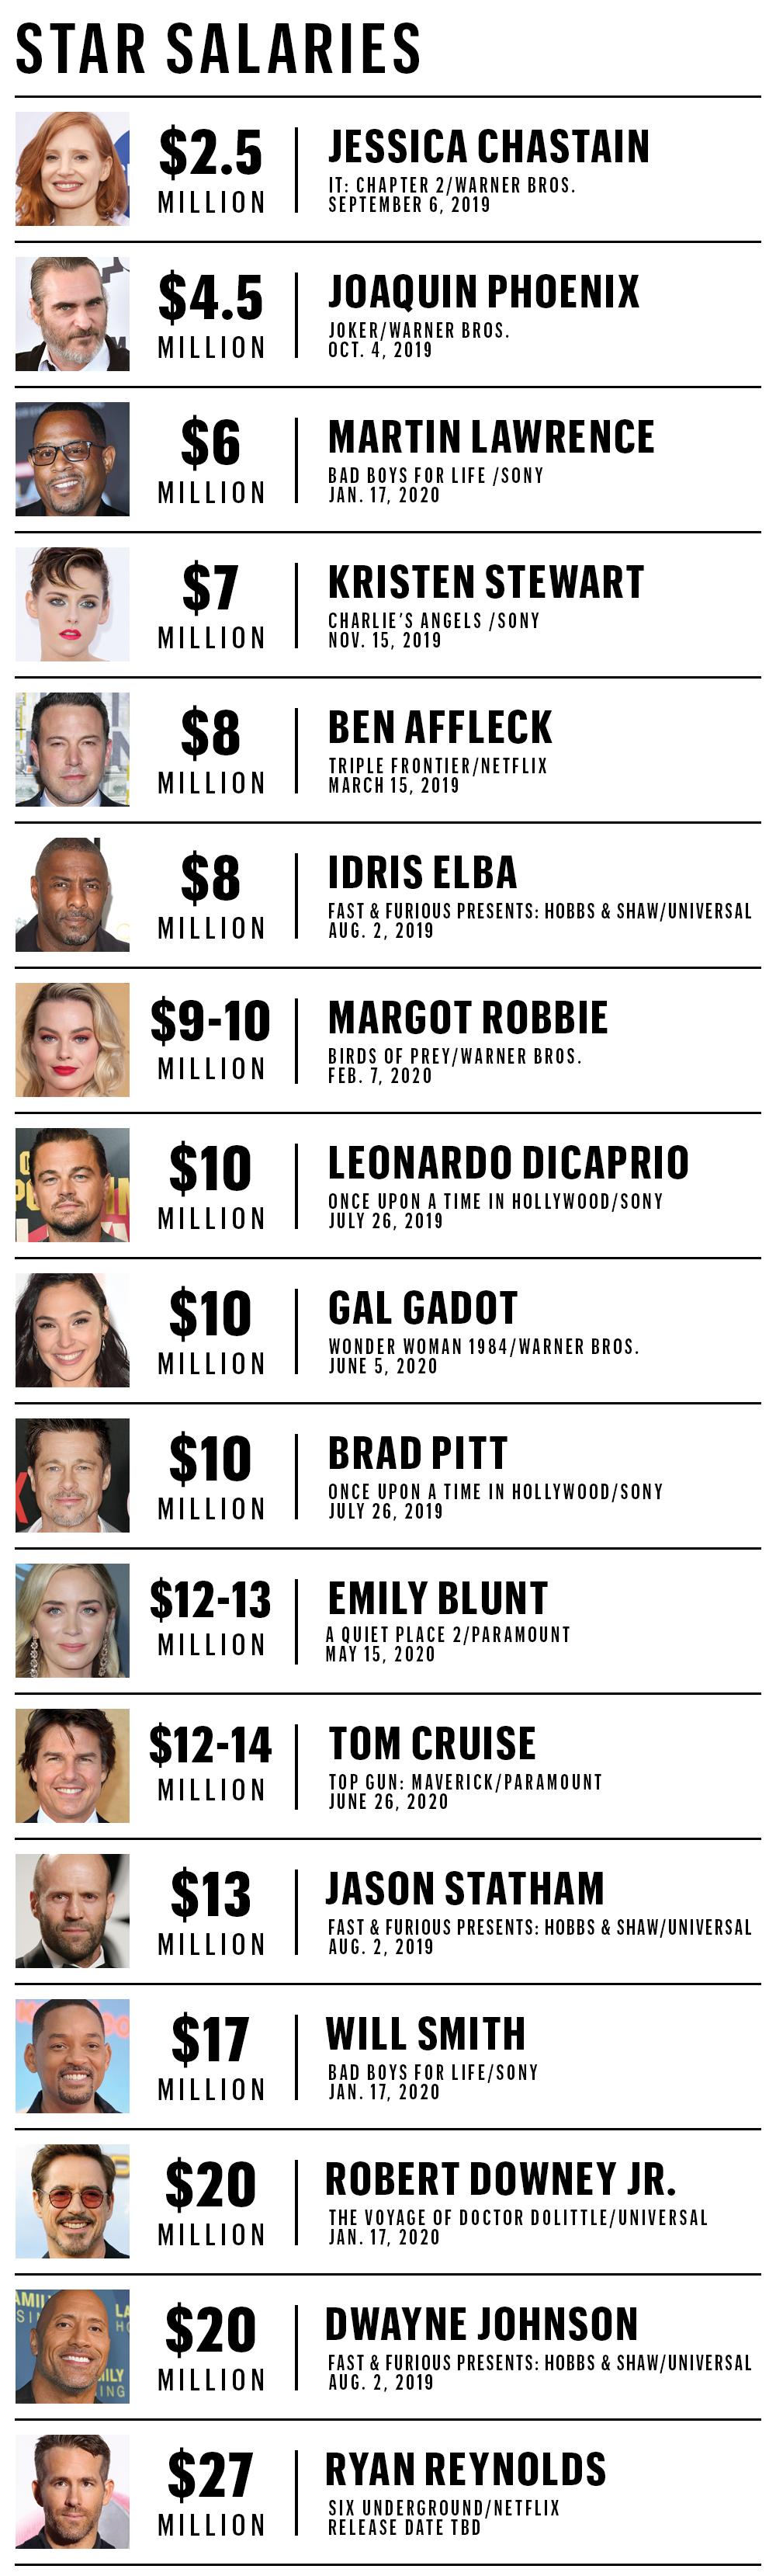 Star Salaries